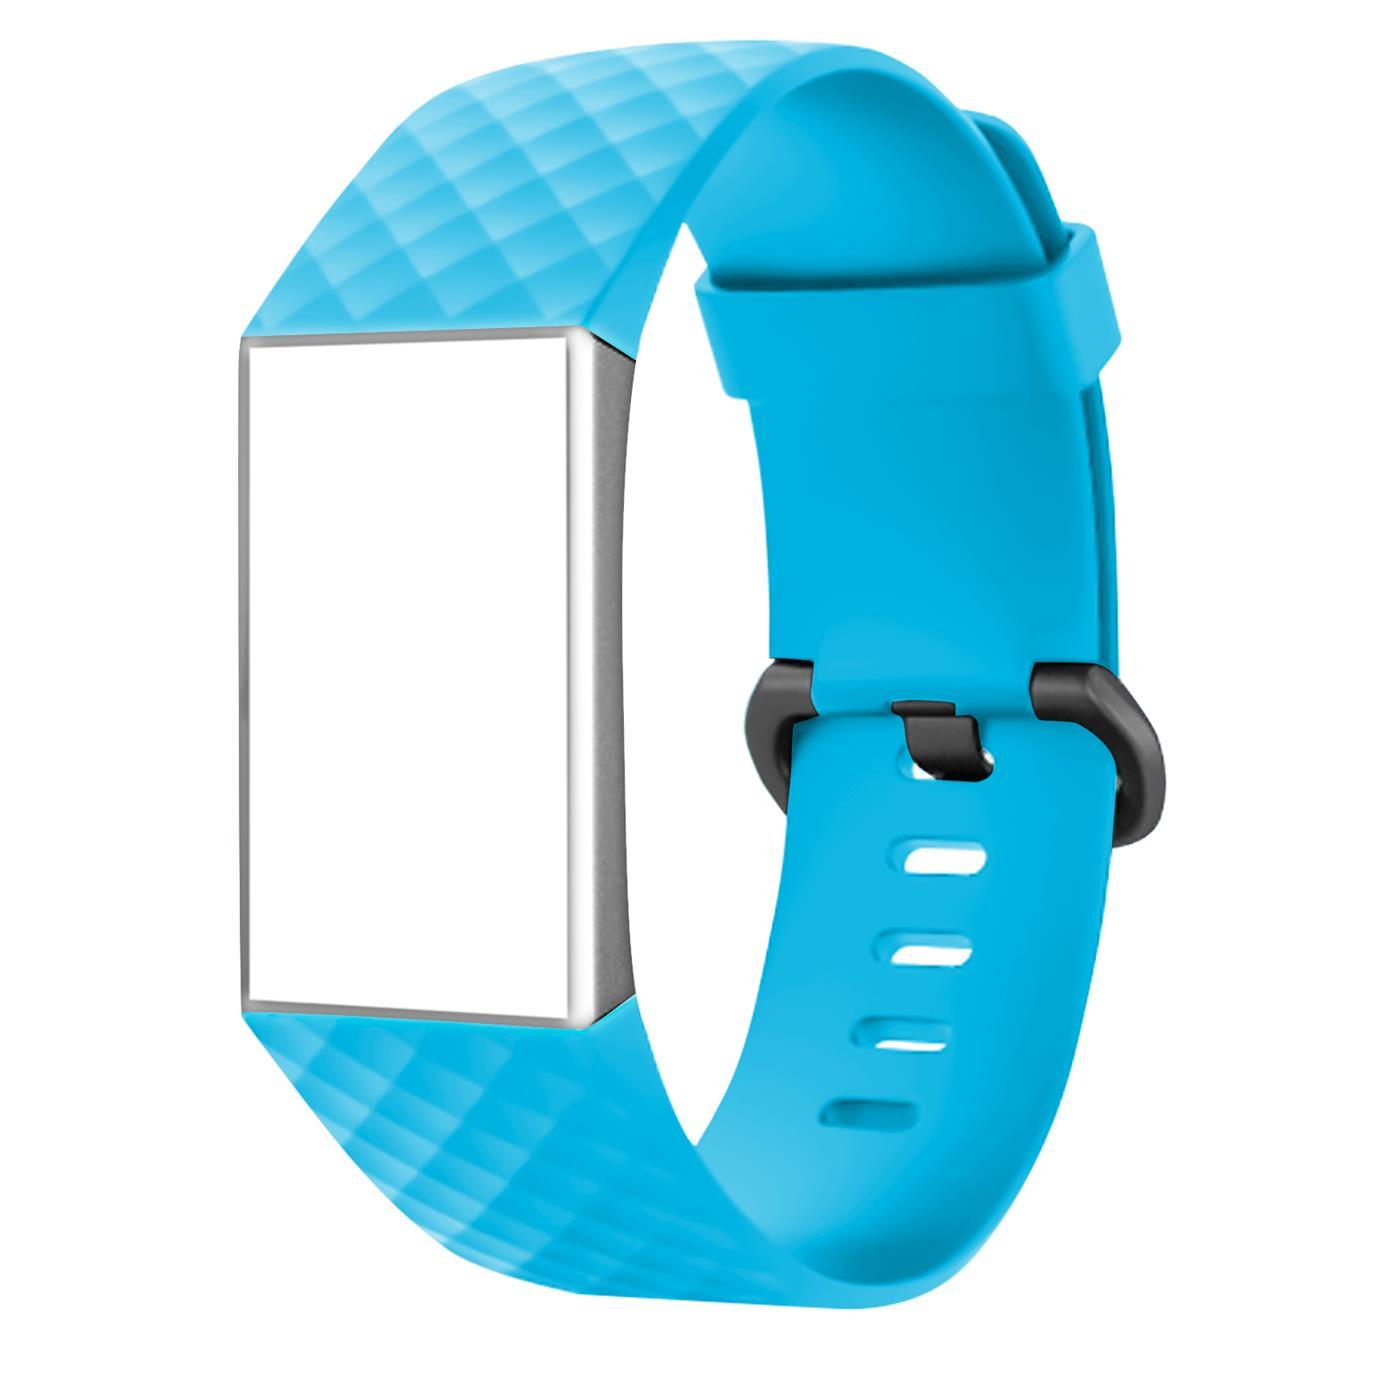 Fitbit-Groesse-S-oder-L-Ersatz-Silikon-Armband-Uhren-Sport-Band-Fitness-Tracker Indexbild 23